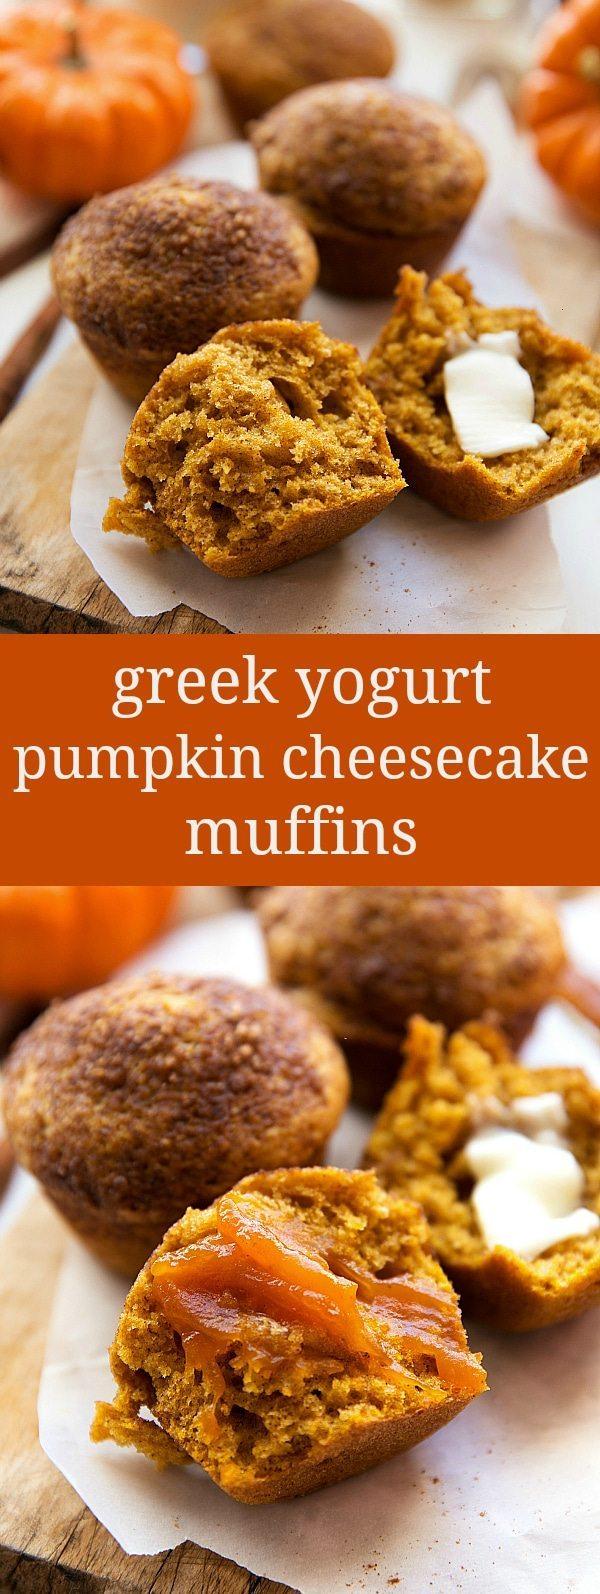 Healthier whole-wheat pumpkin cheesecake muffins made with Greek yogurt